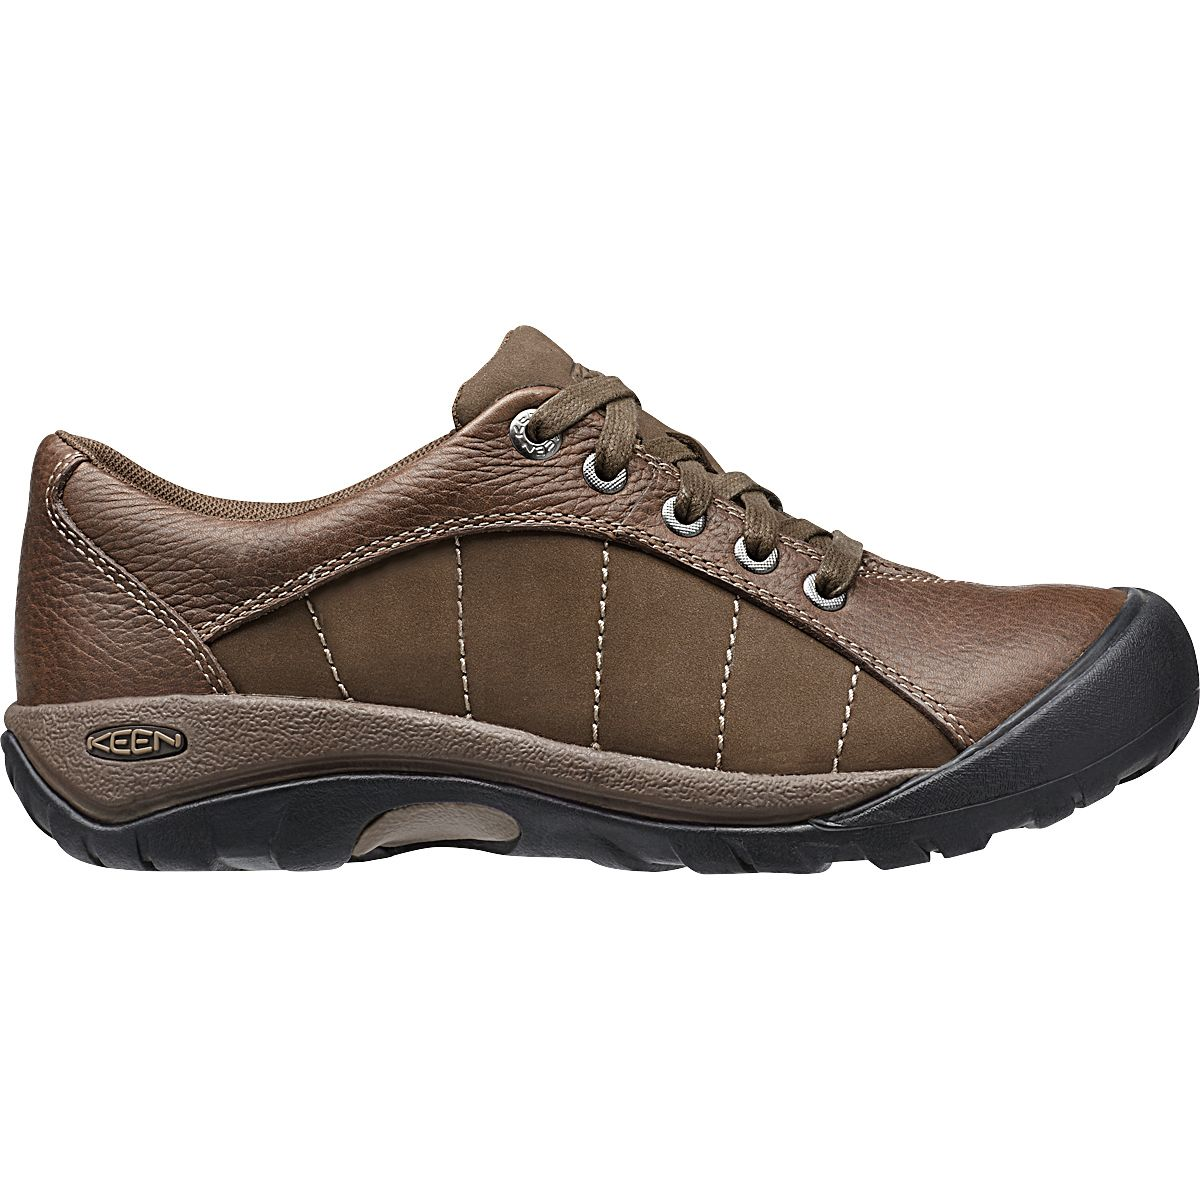 Unique  Results For Keen Koven Hiking Shoe Womens Gargoylealaskan Blue 95